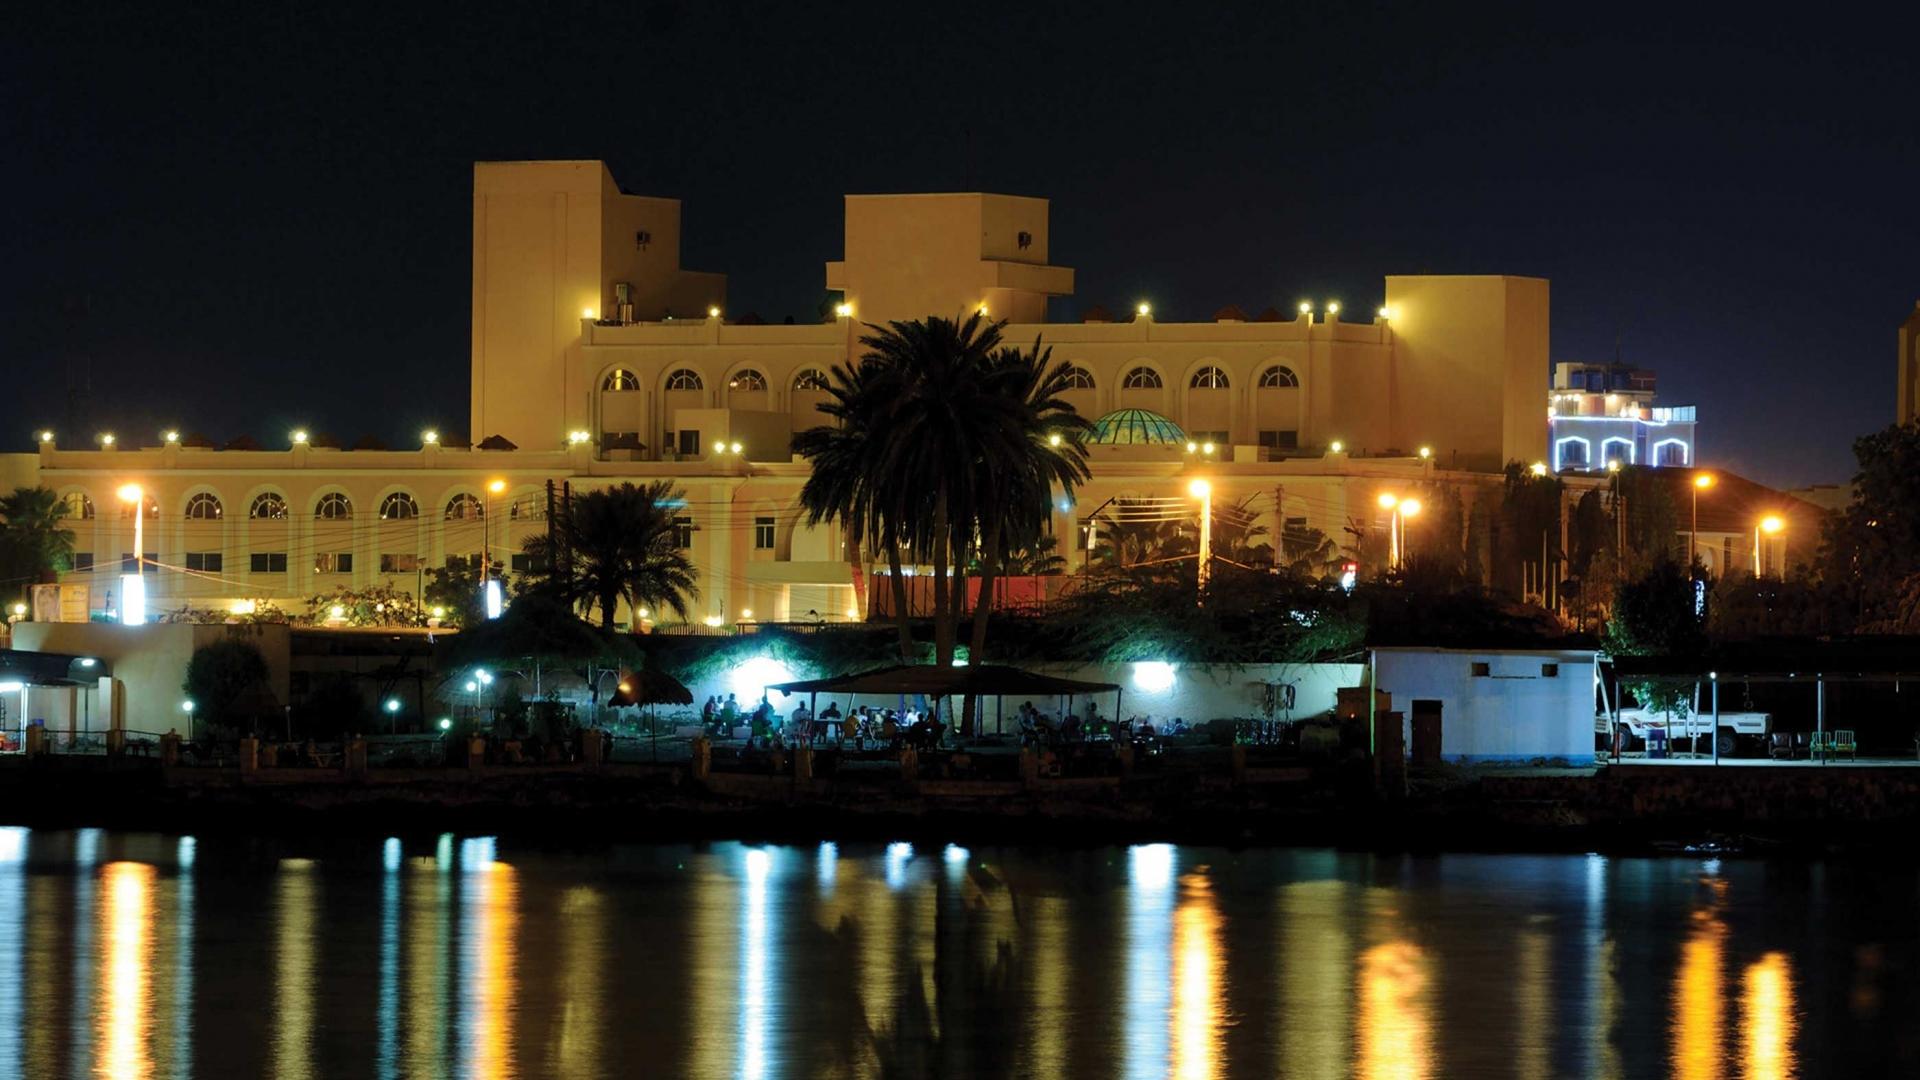 Coral Port Sudan Hotel Hospitality Management Holding